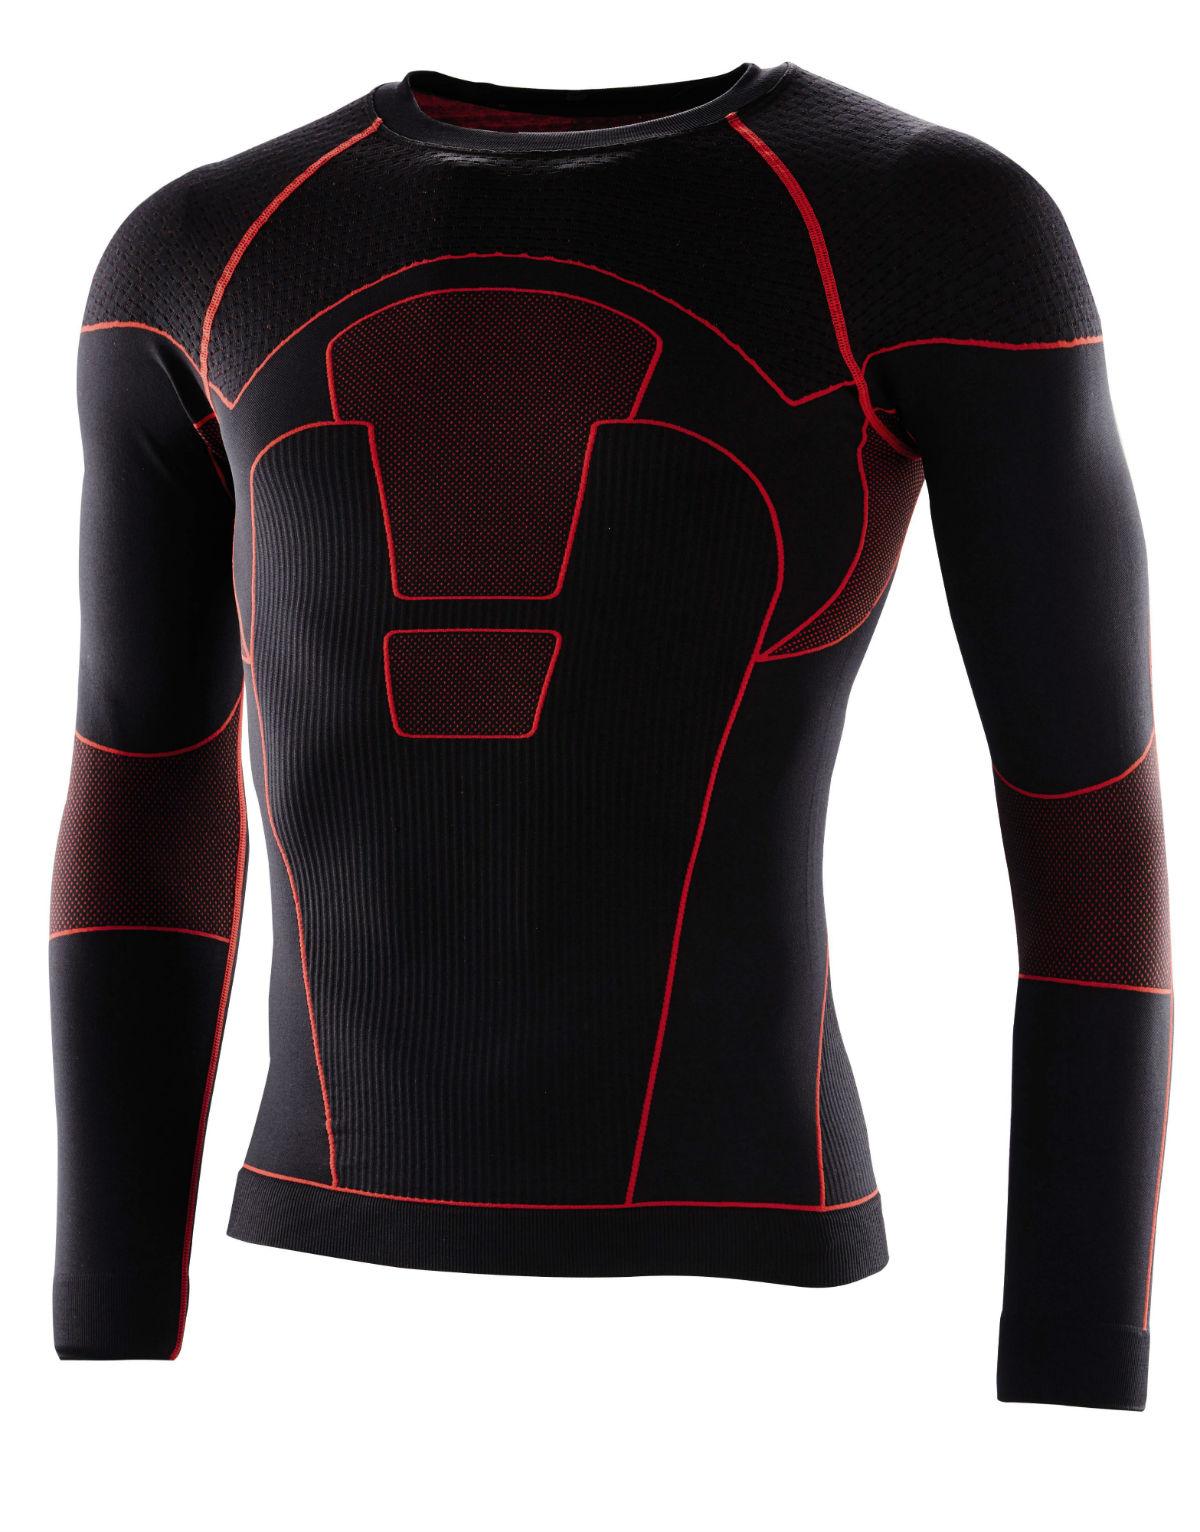 New Aldi Motorcycle Clothing Range Launched Visordown